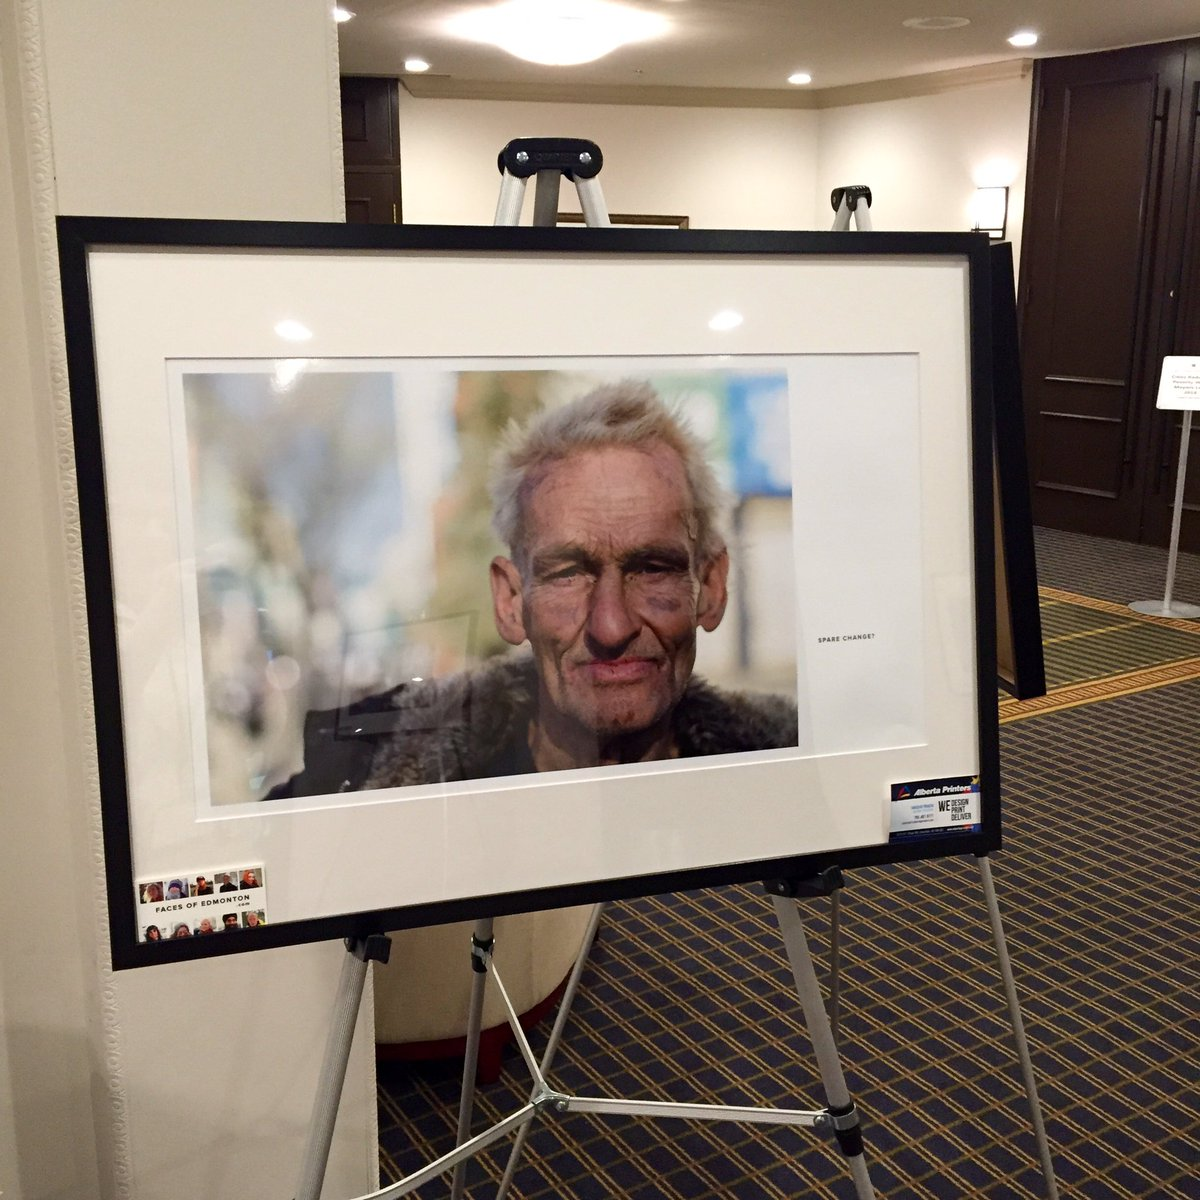 Faces of Edmonton at the #MayorsPovertySummit @Tamarack_Inst @VC_Canada @VibrantCalgary https://t.co/oXU6GyNR0w